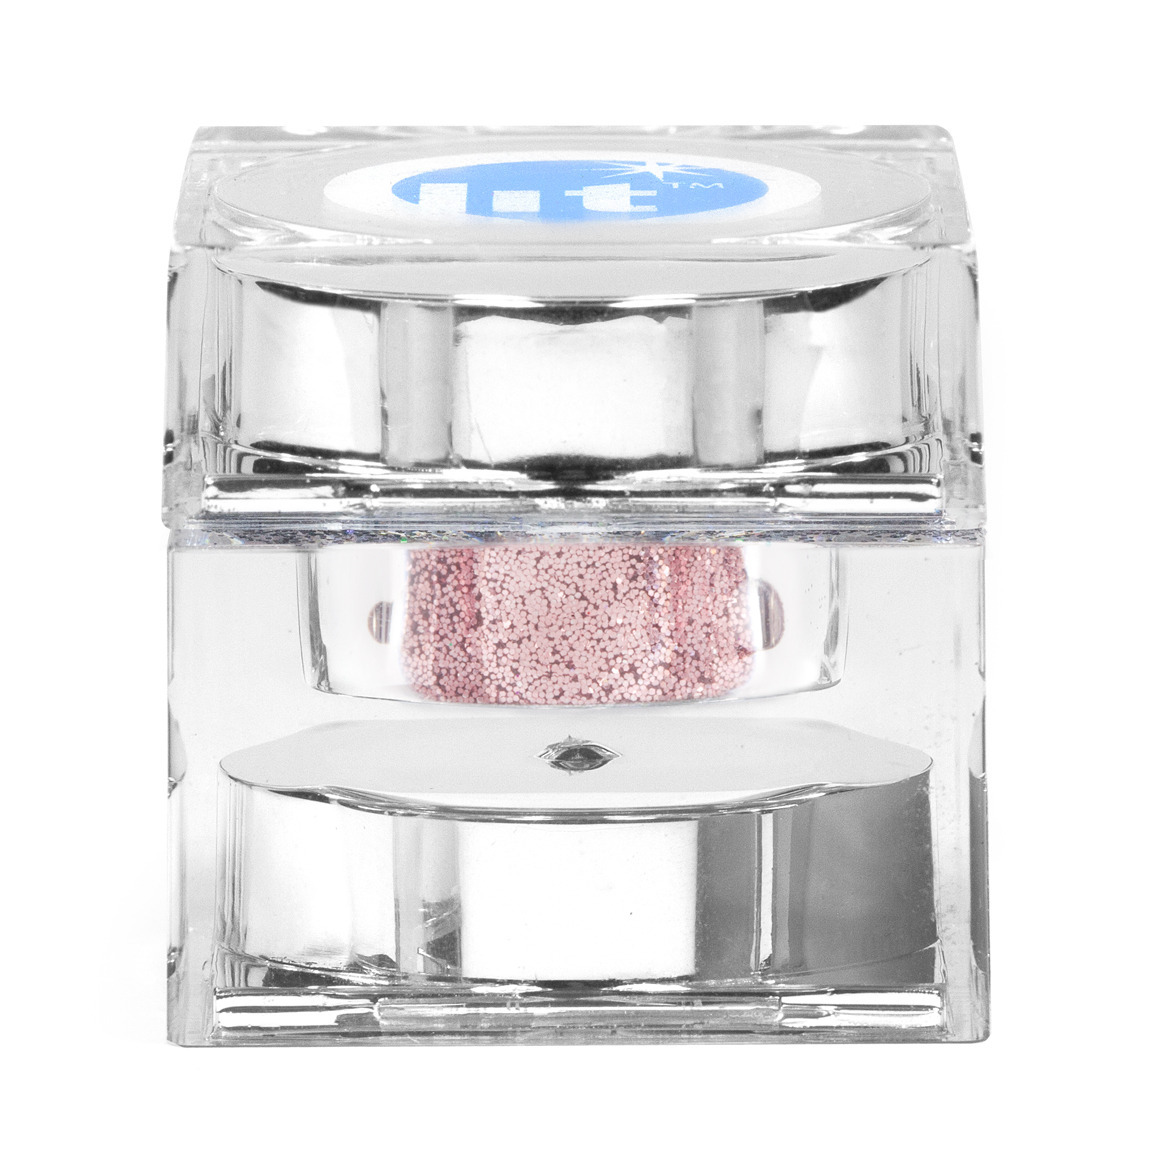 Lit Cosmetics Lit Glitter Pretty in Pink S3 (Solid) alternative view 1.